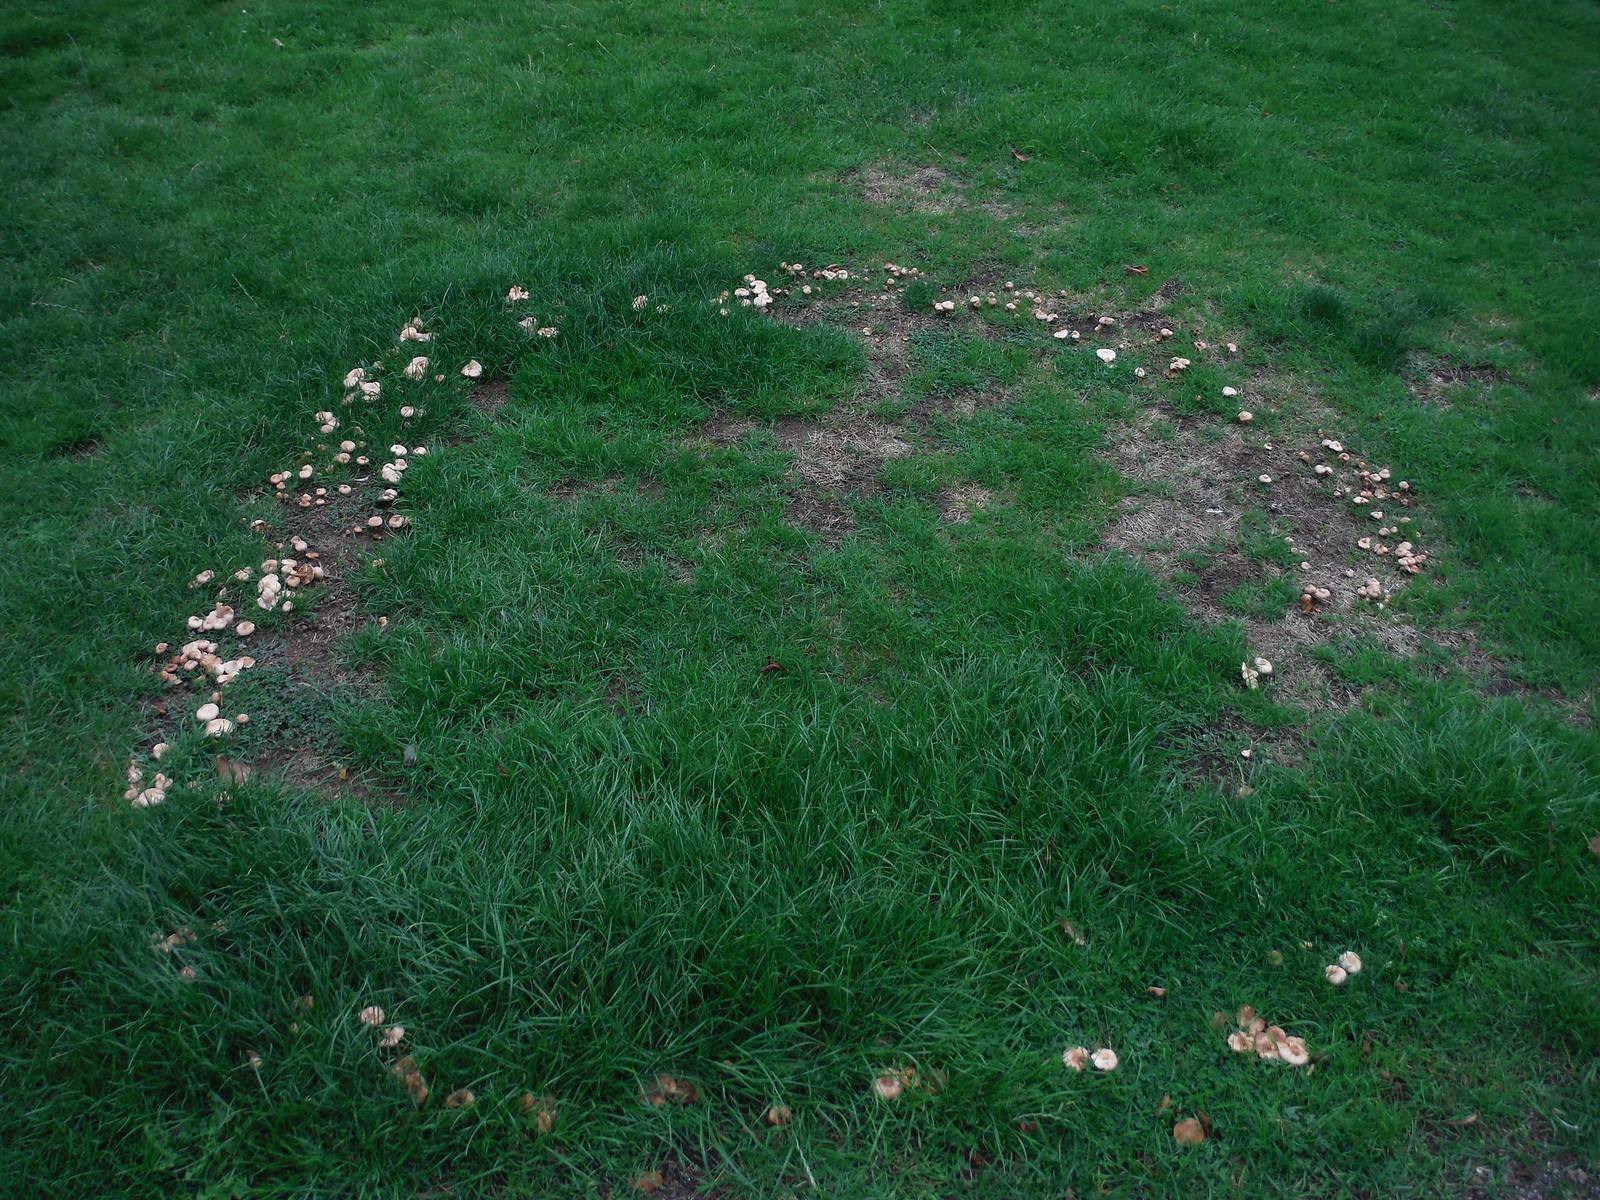 Mushrooms SWC Walk 164 Roydon to Sawbridgeworth via Henry Moore Foundation